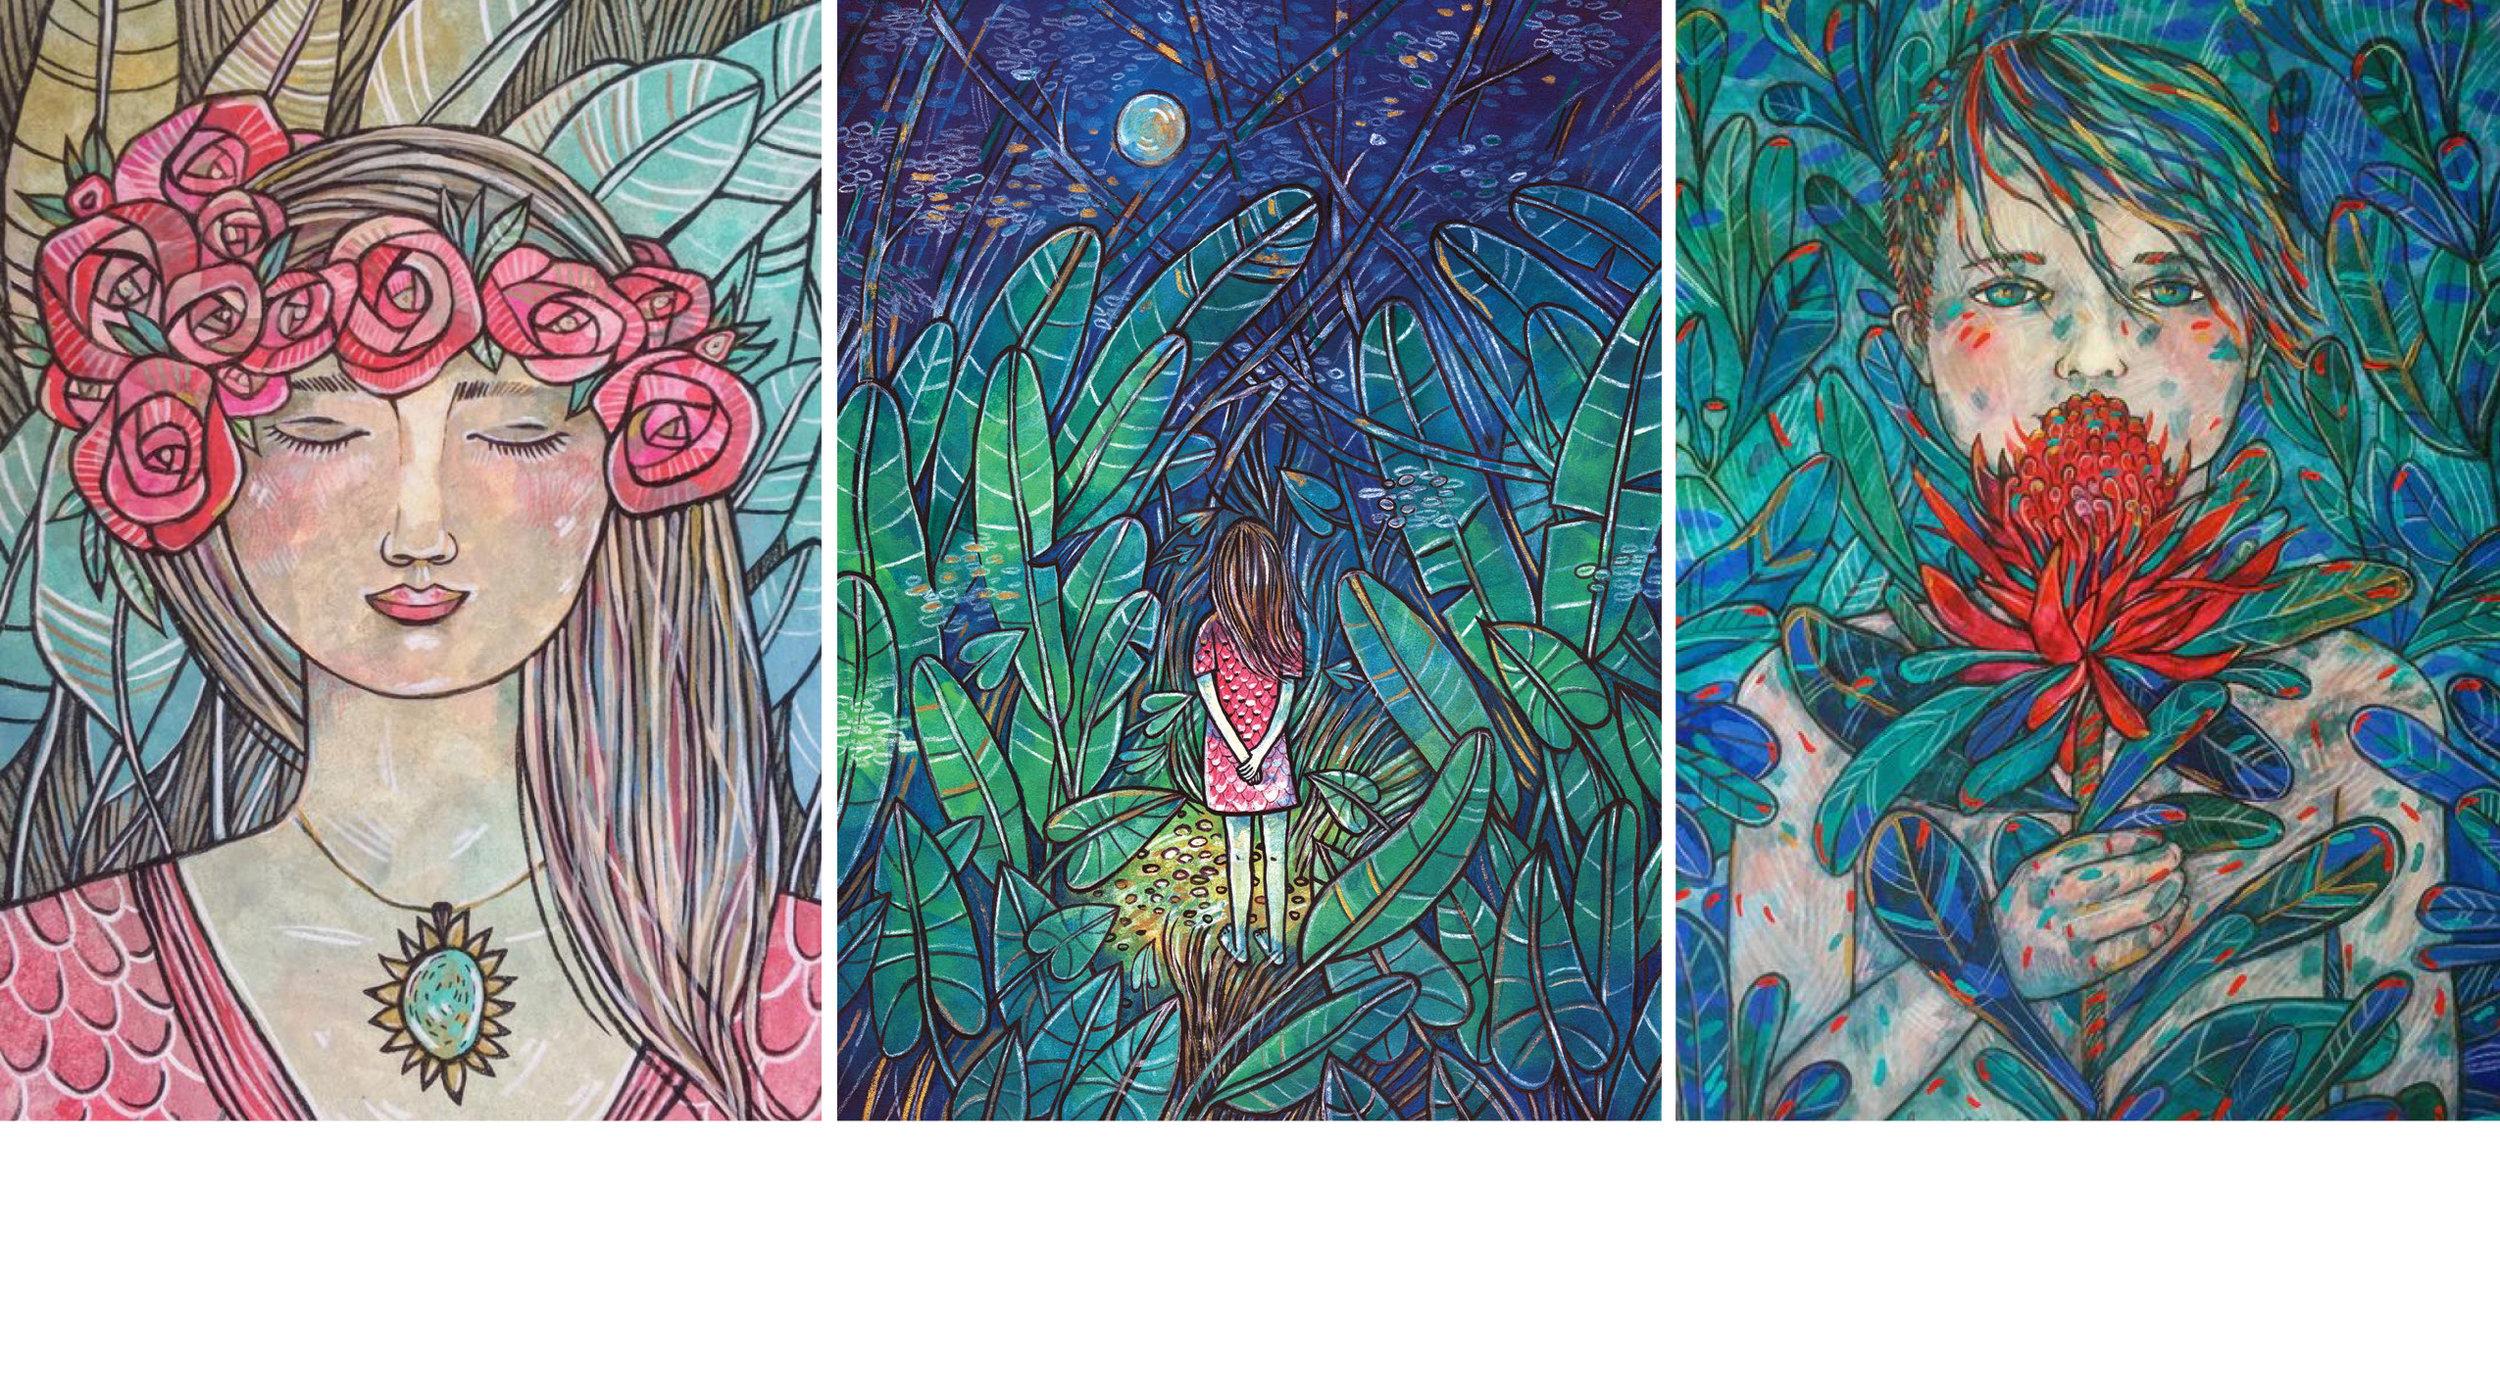 CHILDREN'S BOOK ILLUSTRATIONS     by Heidi Green